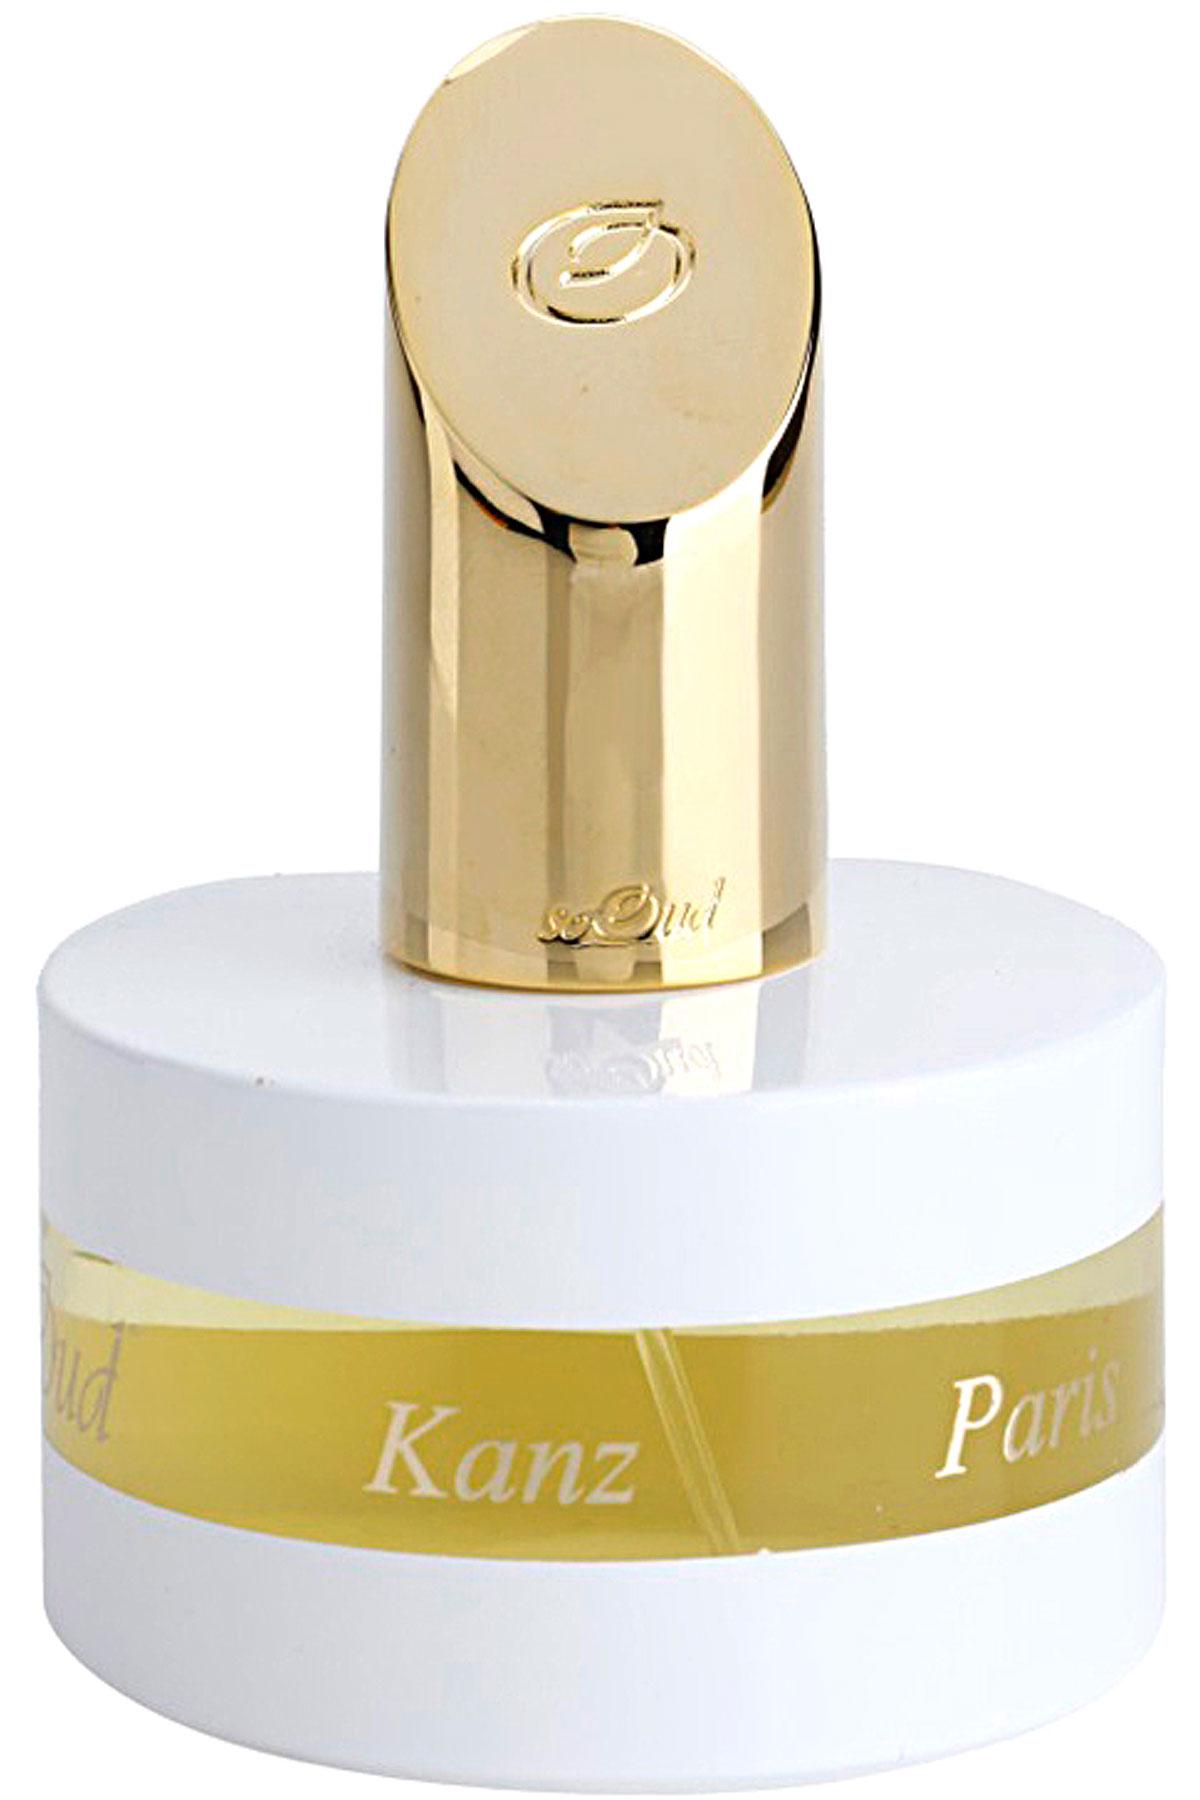 SoOud Fragrances for Men, Kanz - Eau Fine - 60 Ml, 2019, 60 ml